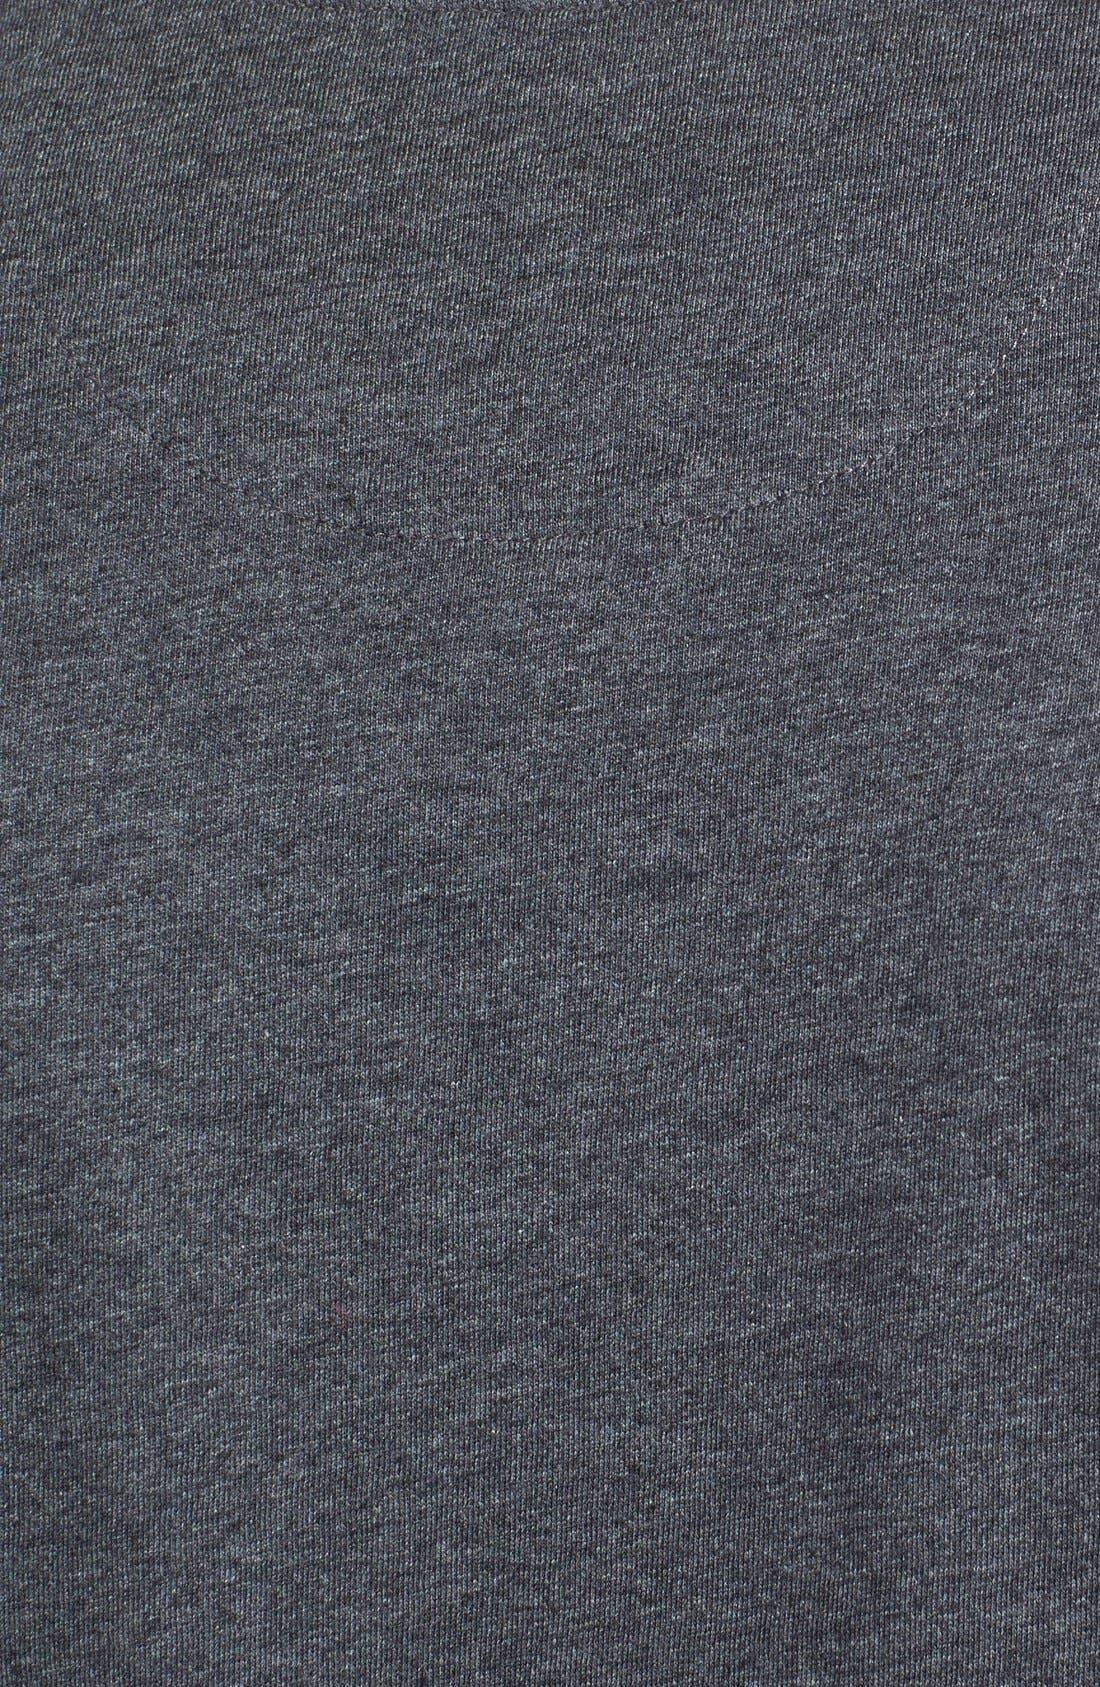 TOMMY BAHAMA, 'New Bali Sky' Original Fit Crewneck Pocket T-Shirt, Alternate thumbnail 7, color, CHARCOAL HEATHER